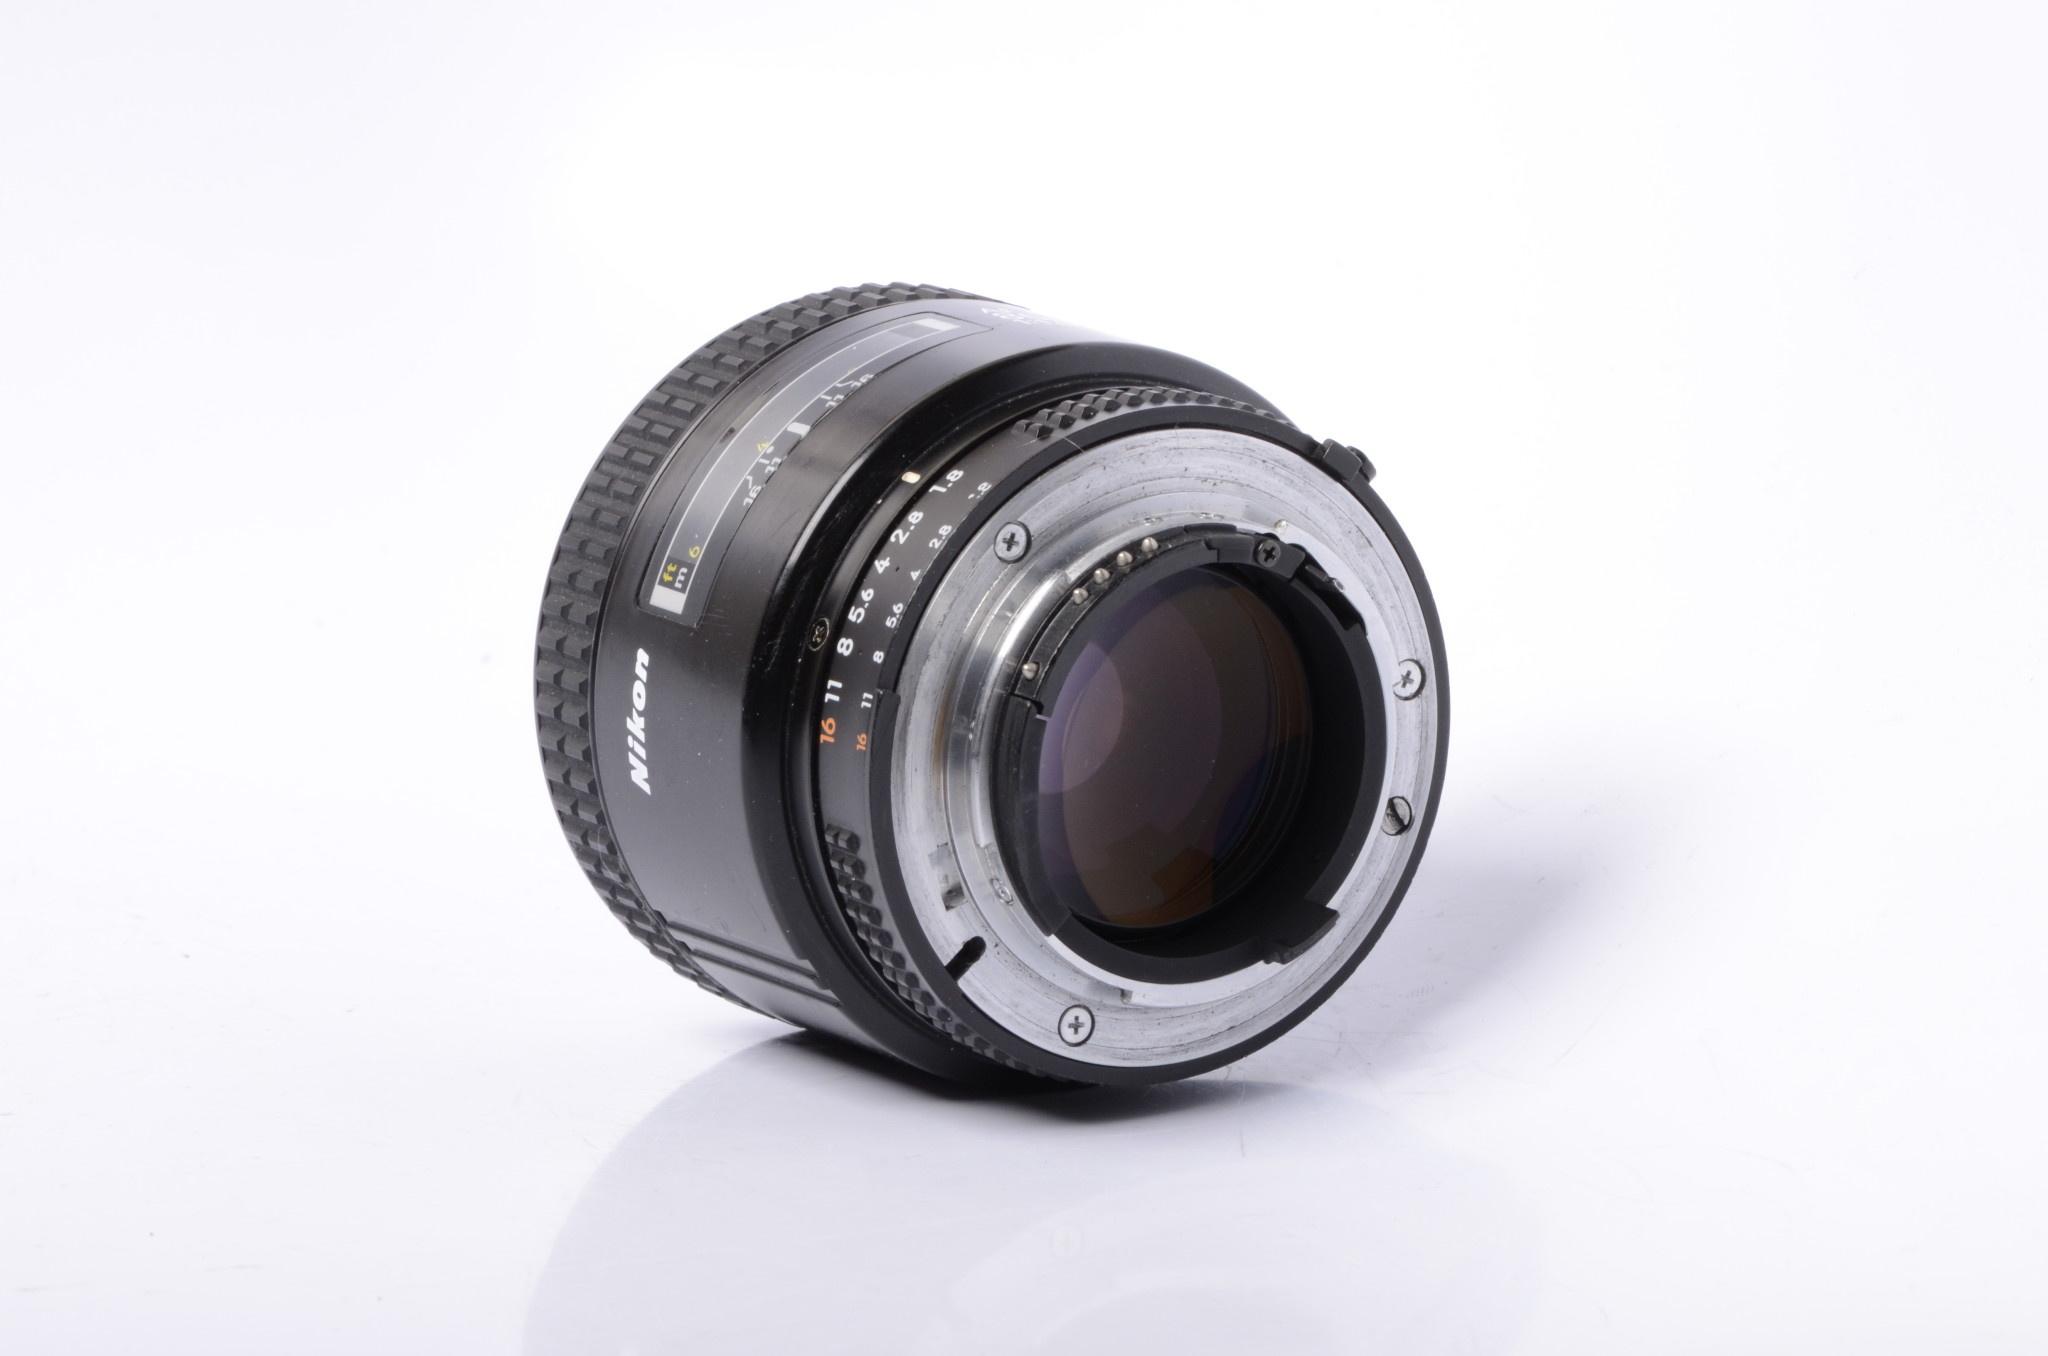 Nikon Nikon 85mm f/1.8 AF SN: 225197